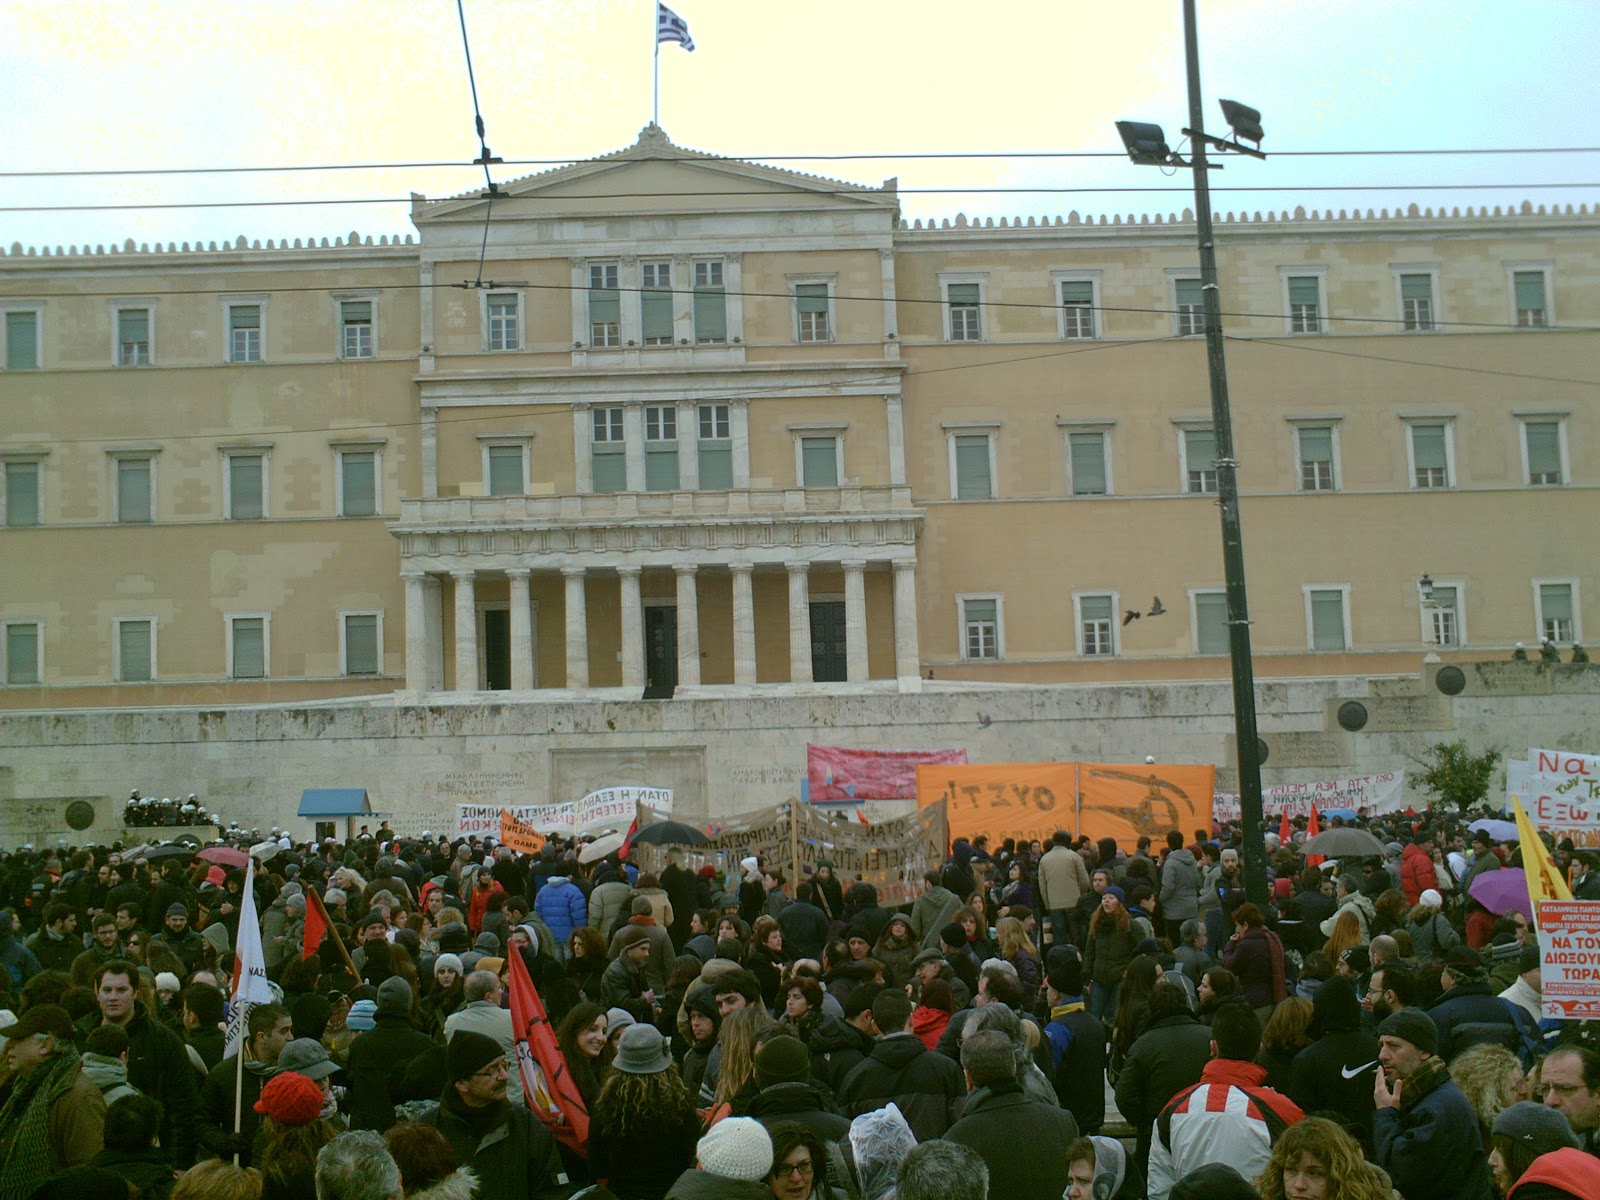 European Tribune - Greece: they must not pass